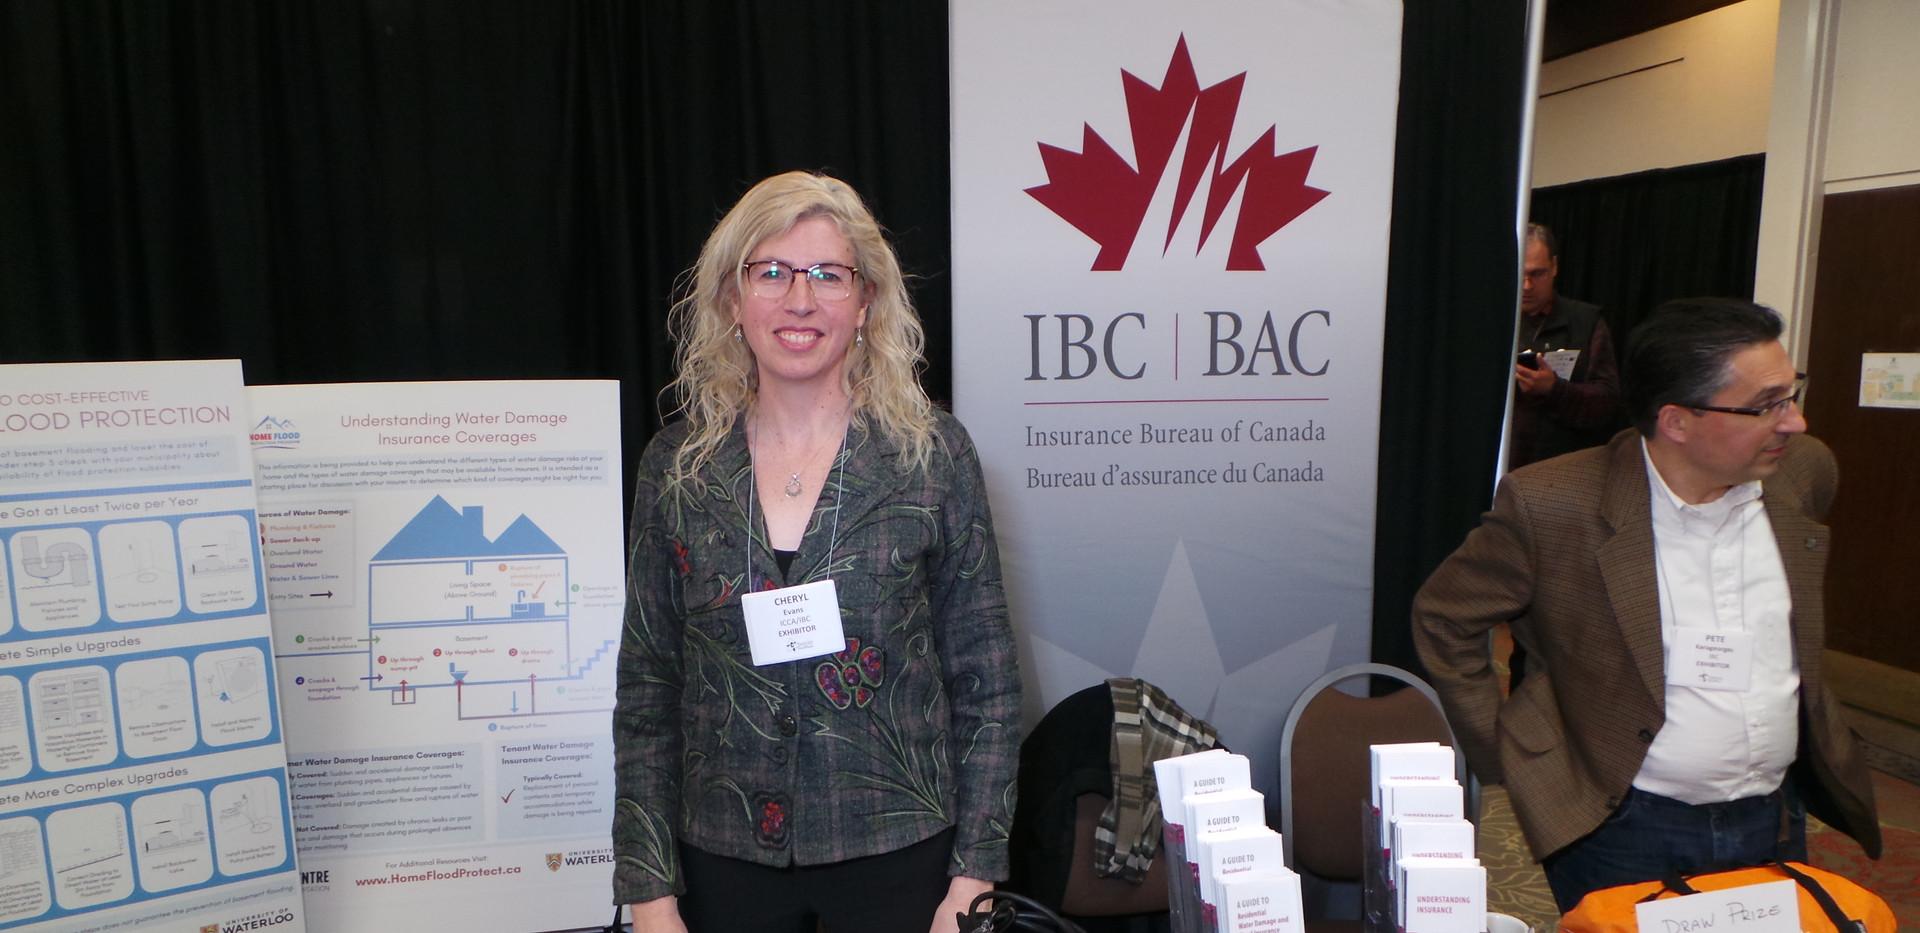 OED20 IBC ICCA Cheryl Evans 20200229_hh.